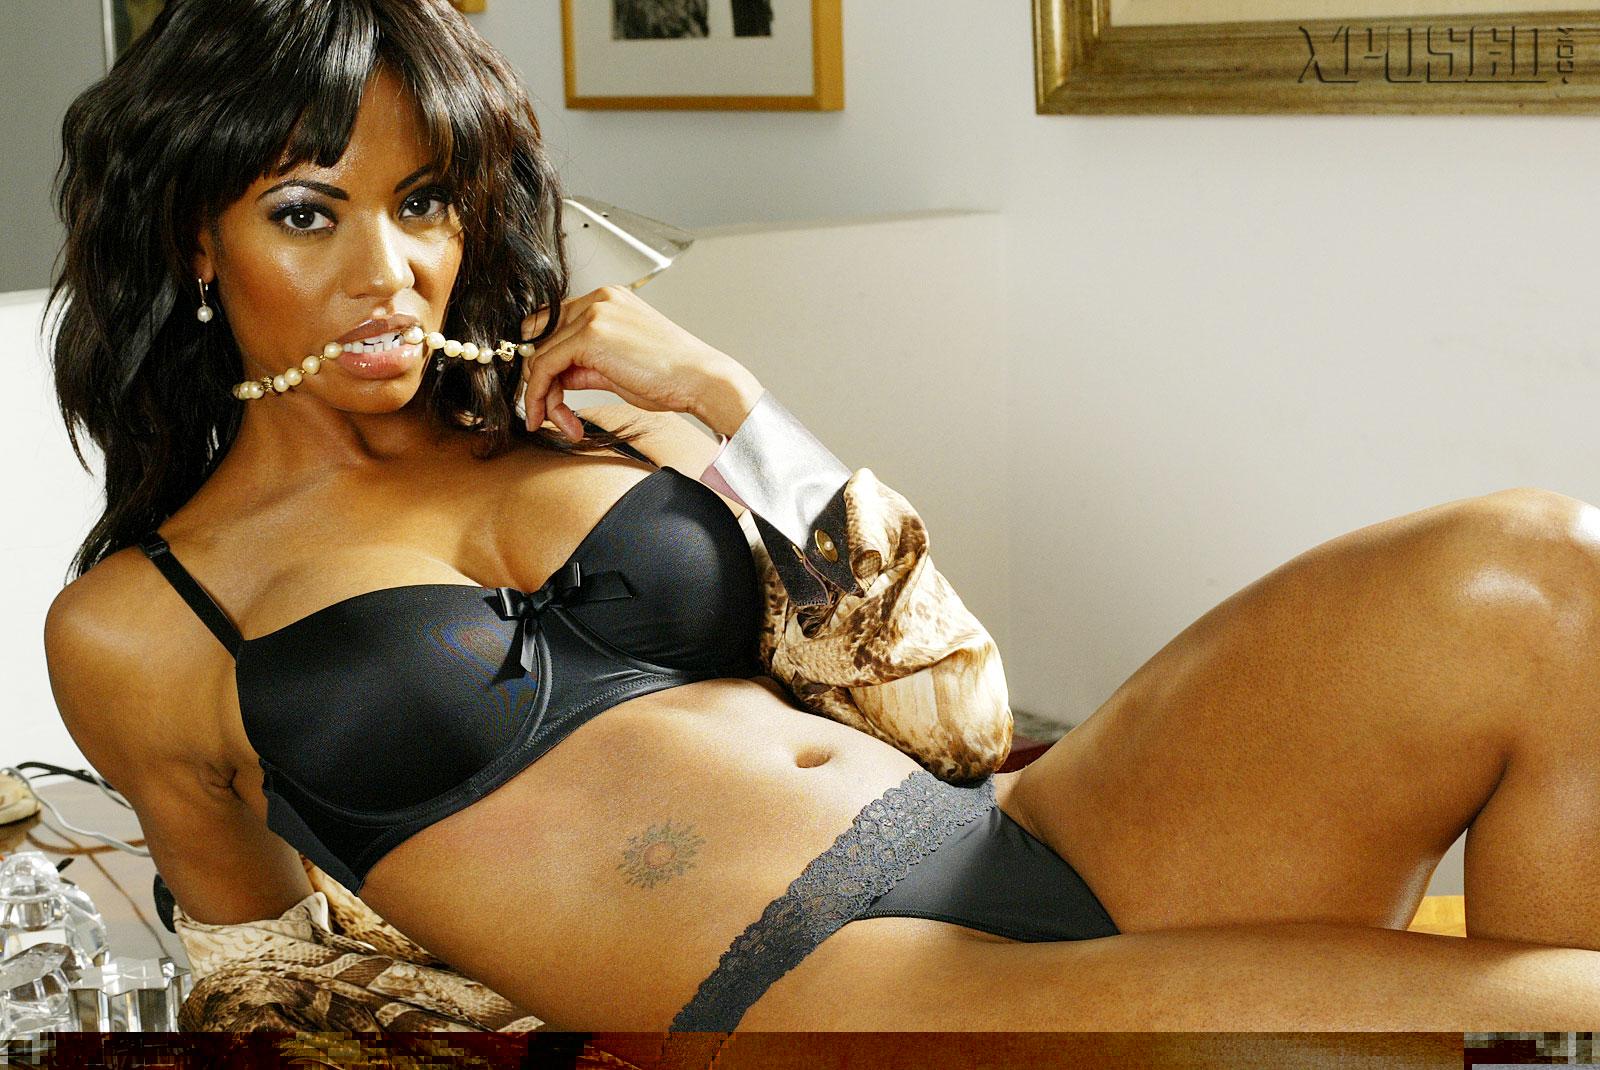 Candace Smith No Source Hot Cute Big Tits Tits Famous Ebony Babe